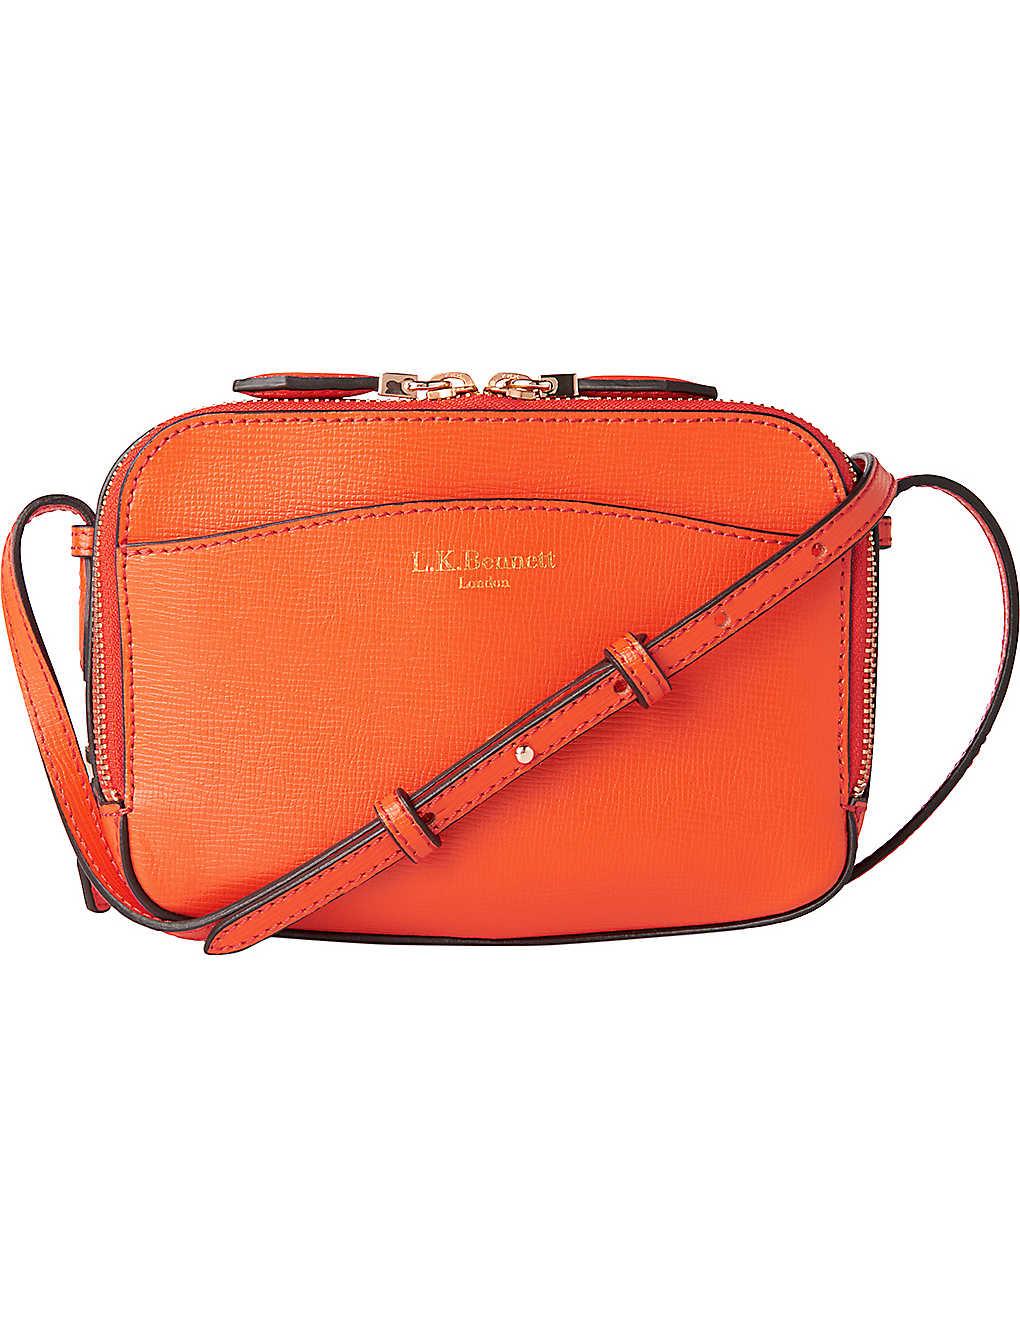 85c5568eb5ca LK BENNETT - Mariel saffiano leather cross-body bag | Selfridges.com